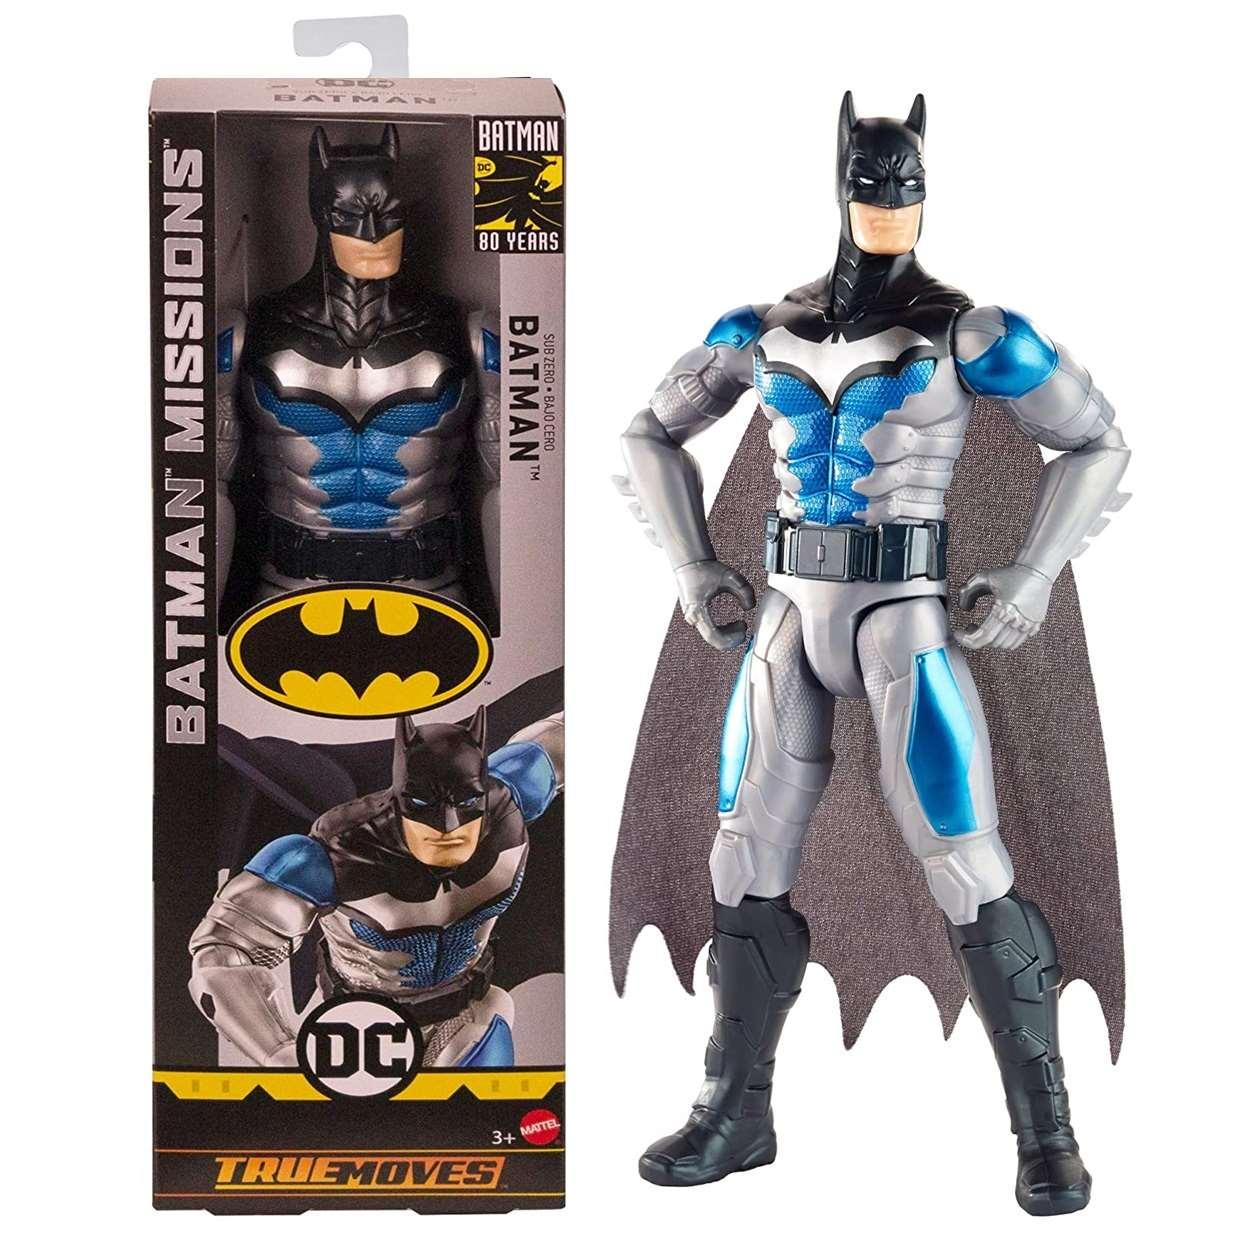 Batman Sub Zero Figura Batman Missions True Movies 12 Pulg